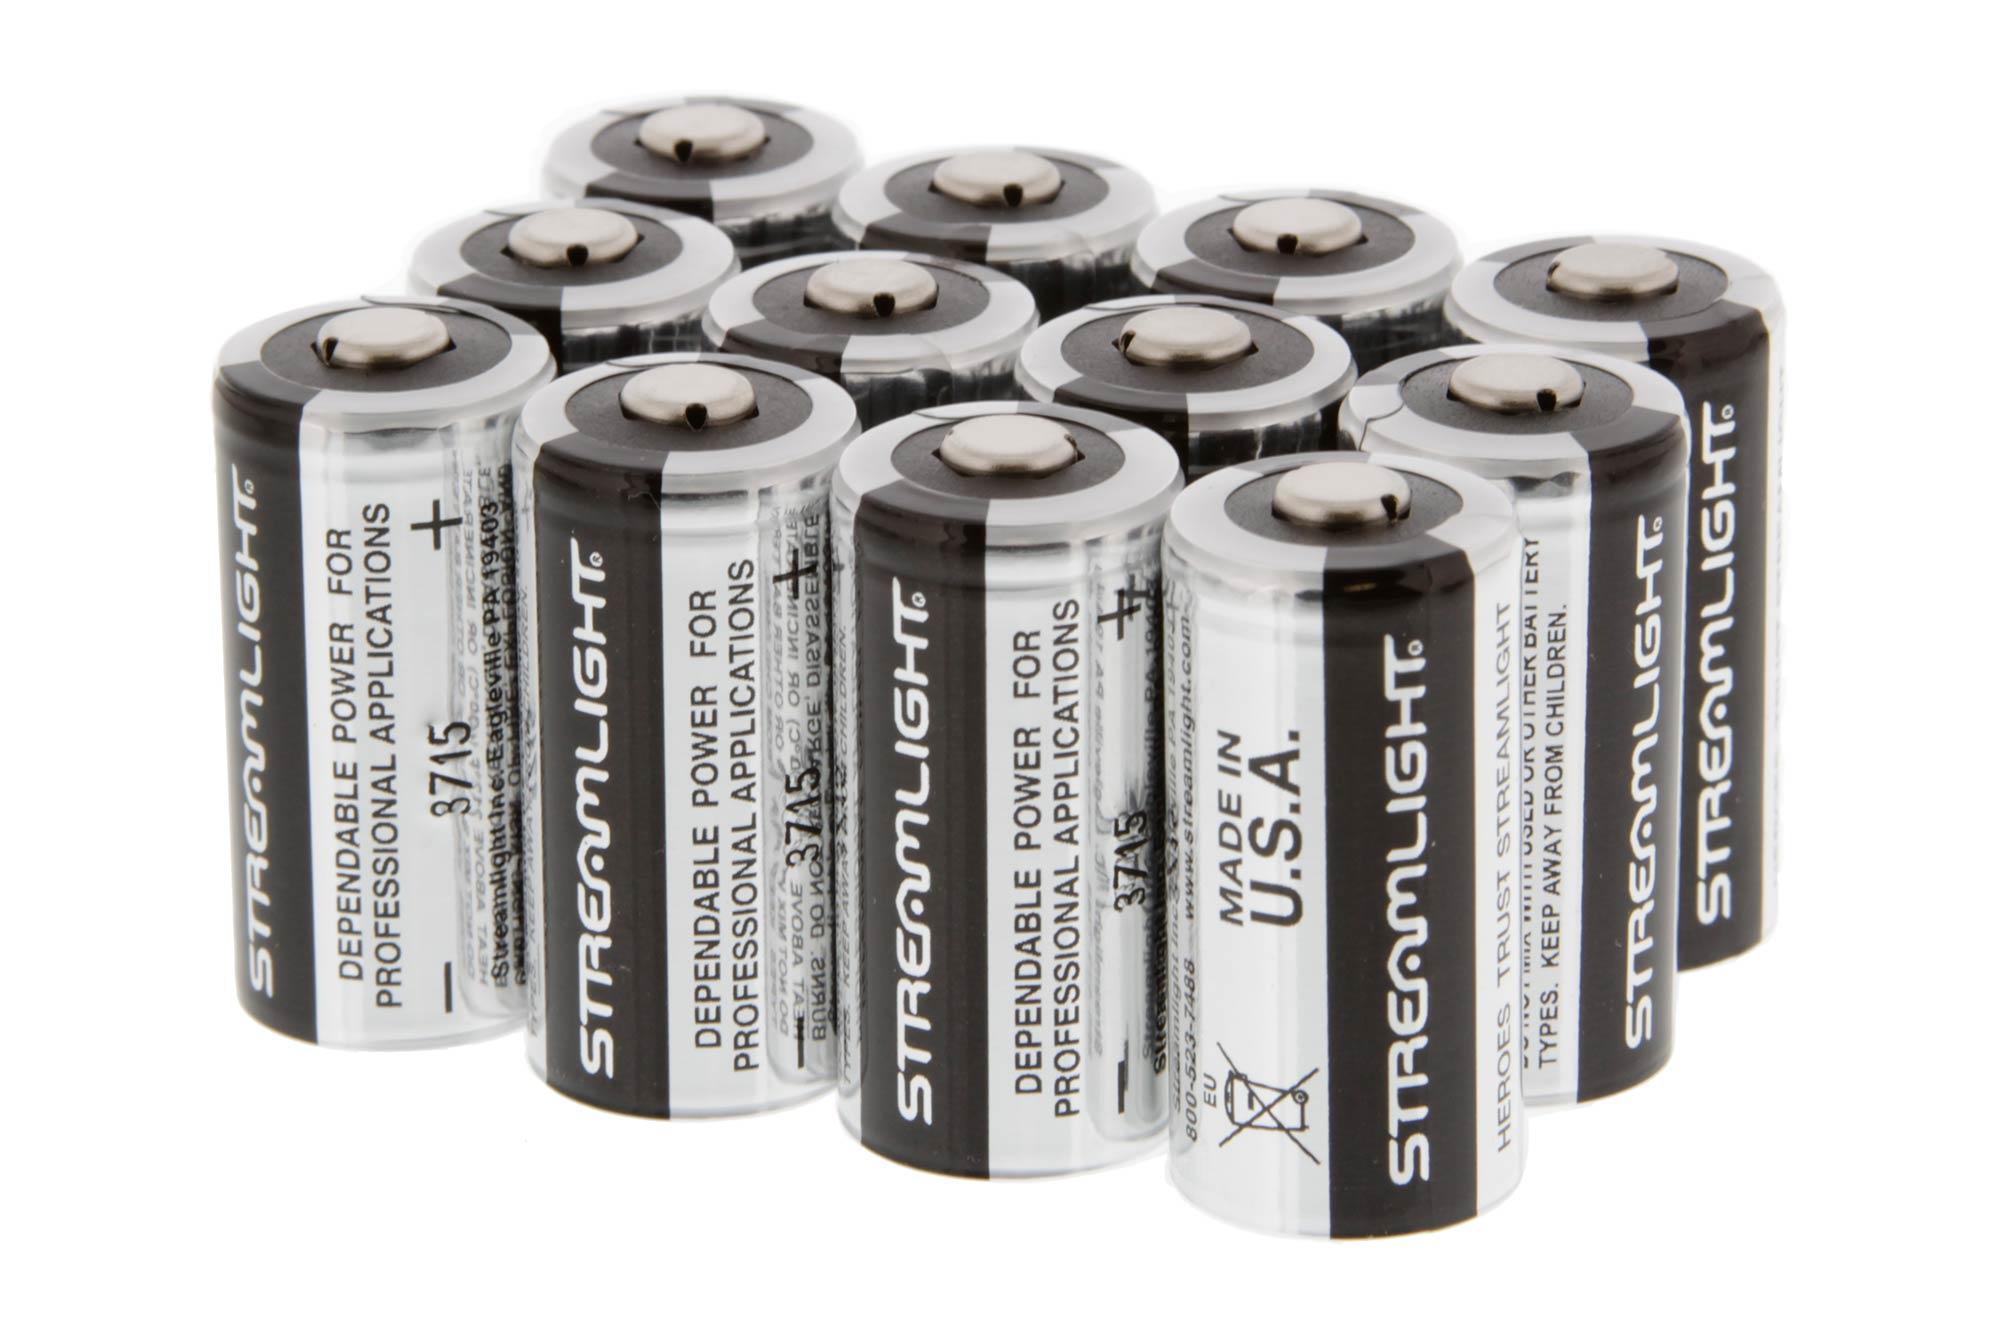 Streamlight Cr123a 3v Lithium Batteries 12 Pack Stl85177 12pk